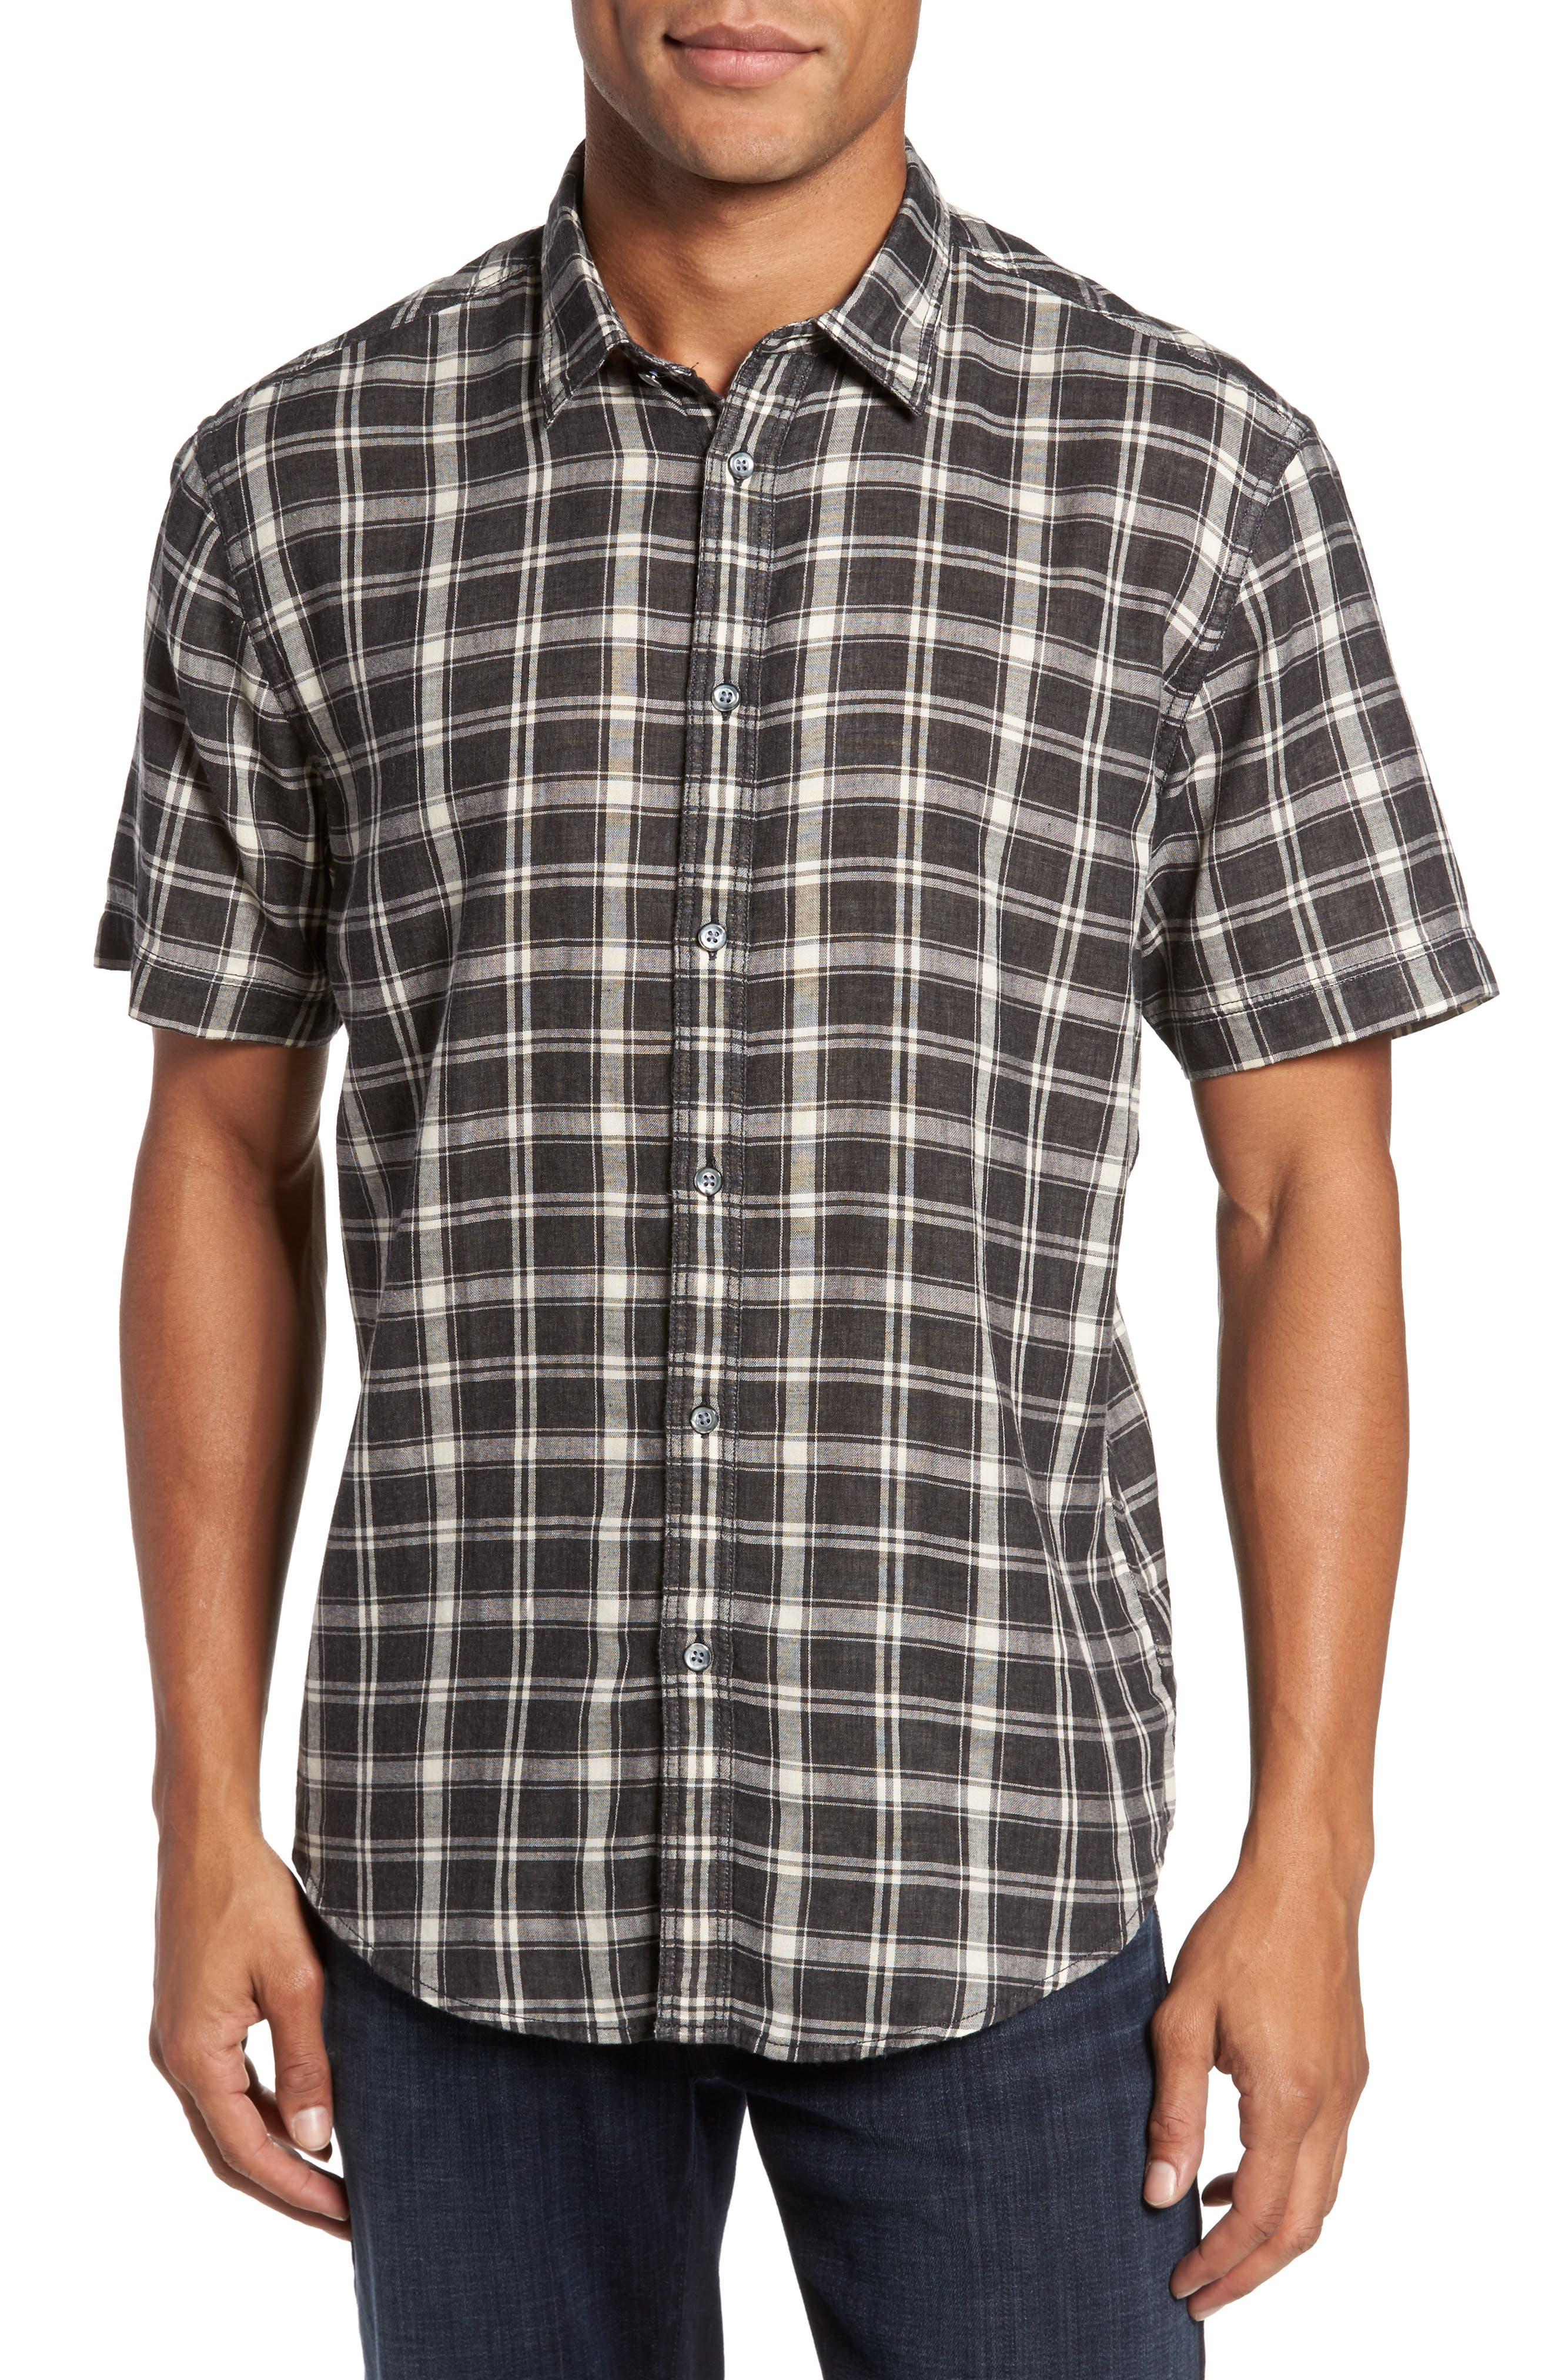 Alternate Image 1 Selected - Coastaoro Hansen Regular Fit Plaid Sport Shirt